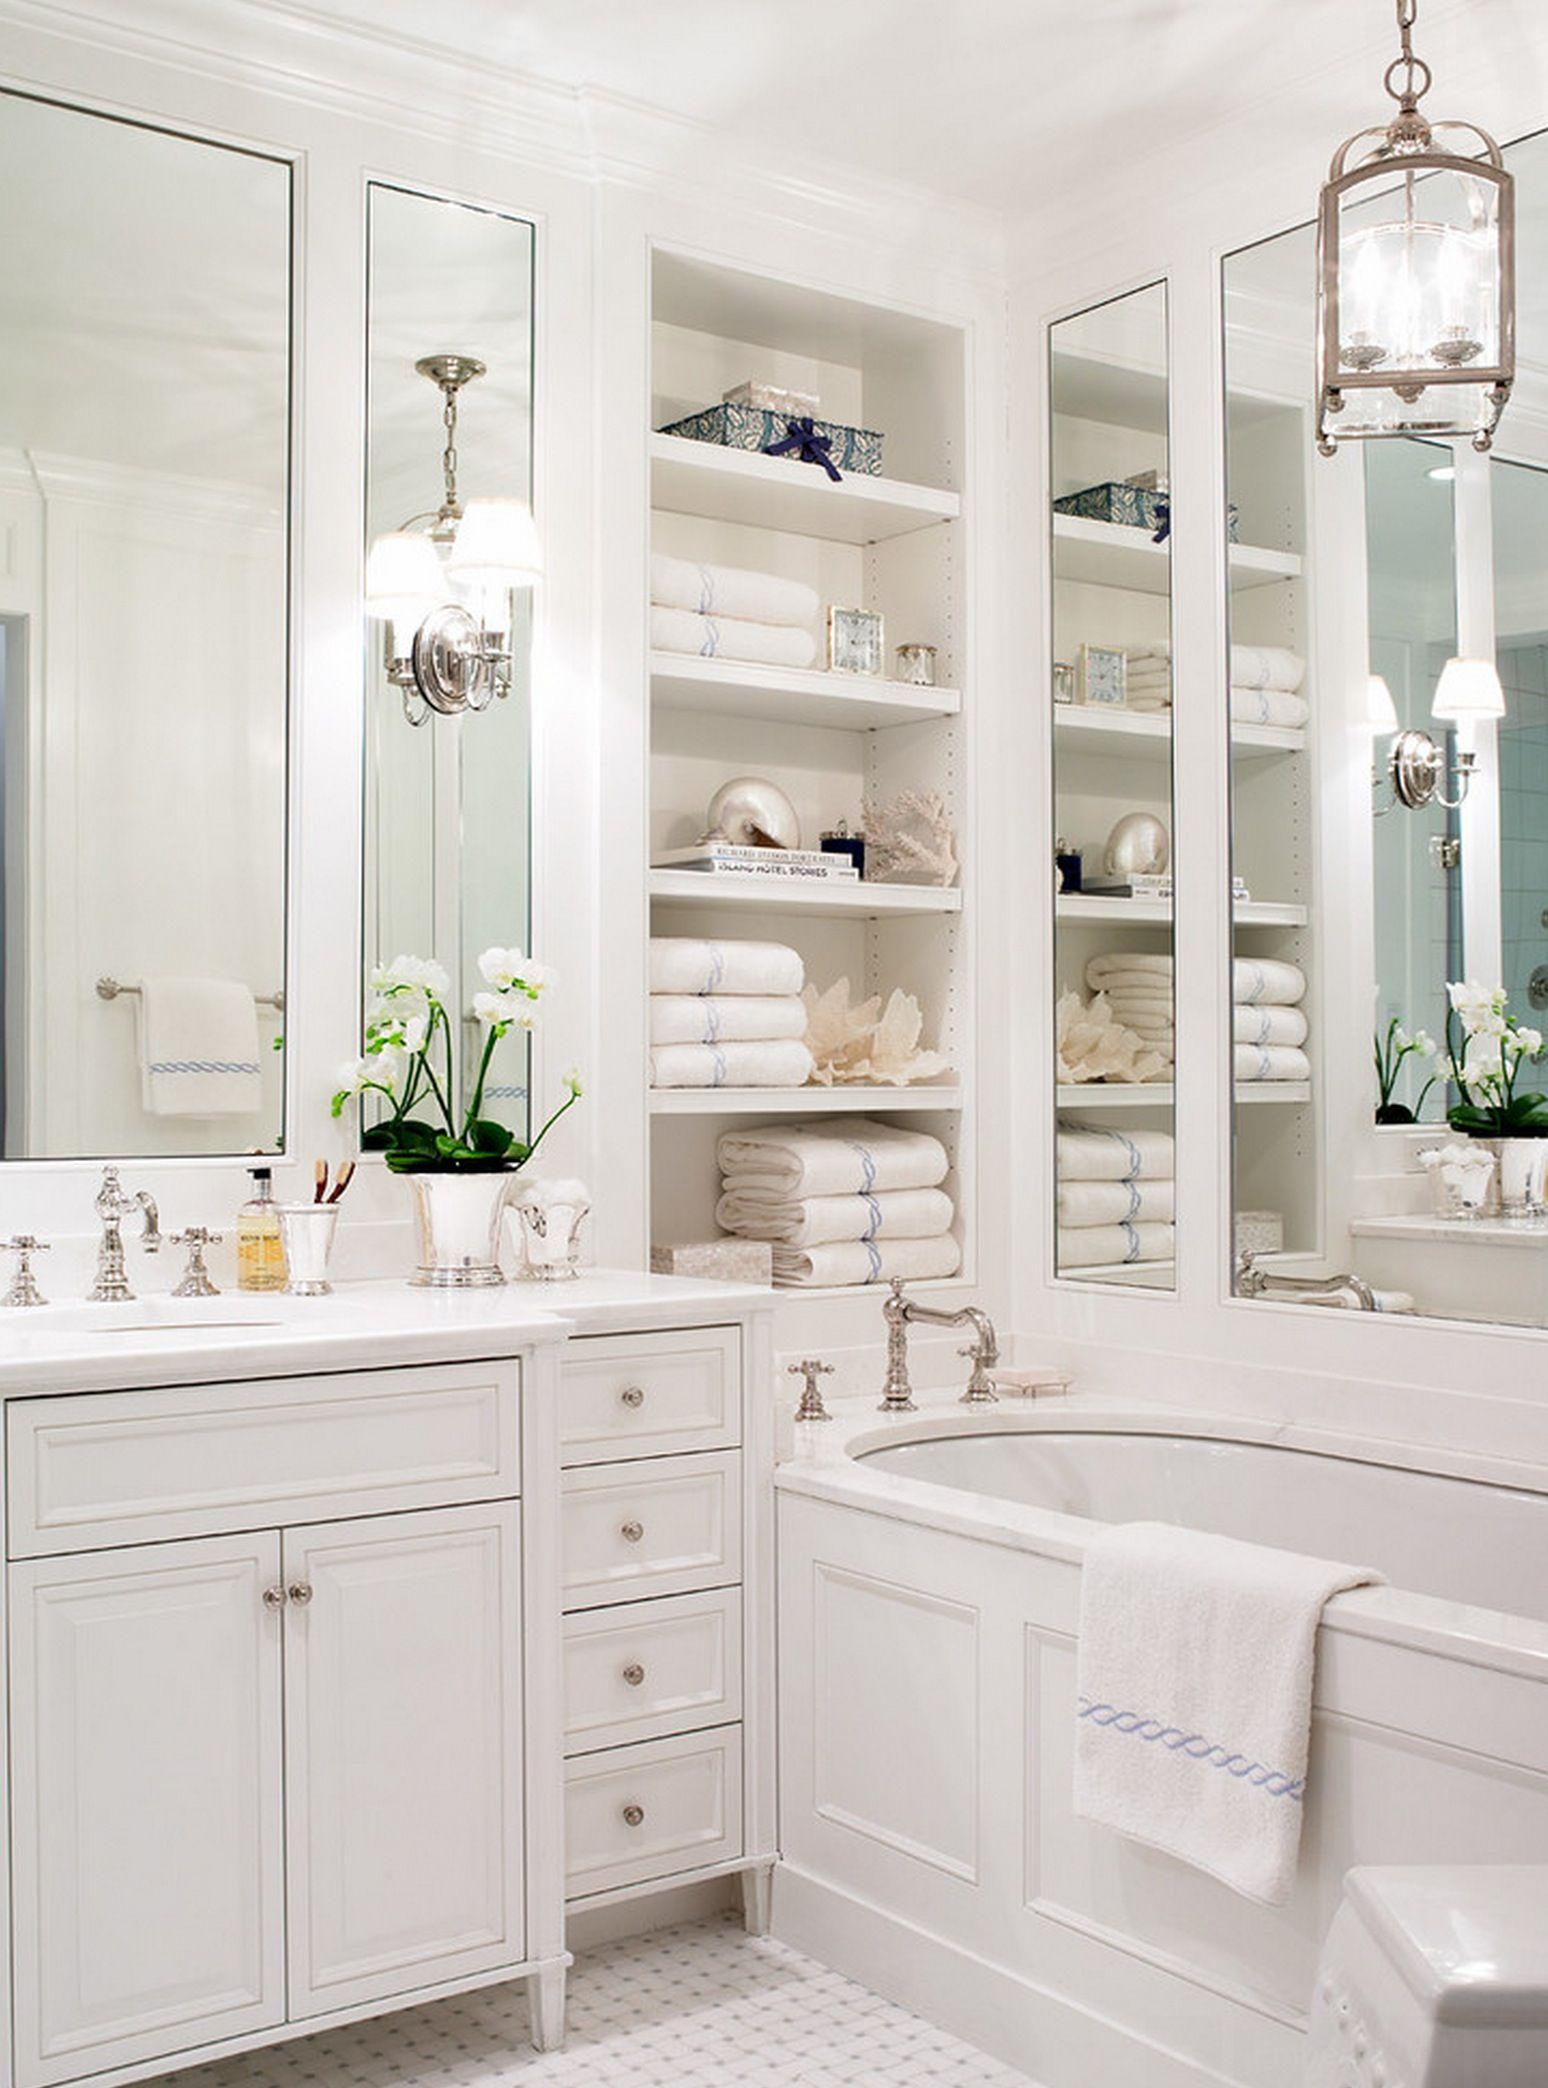 Bathroom Design August 2014 78   Bathroom   Pinterest   August 2014 ...